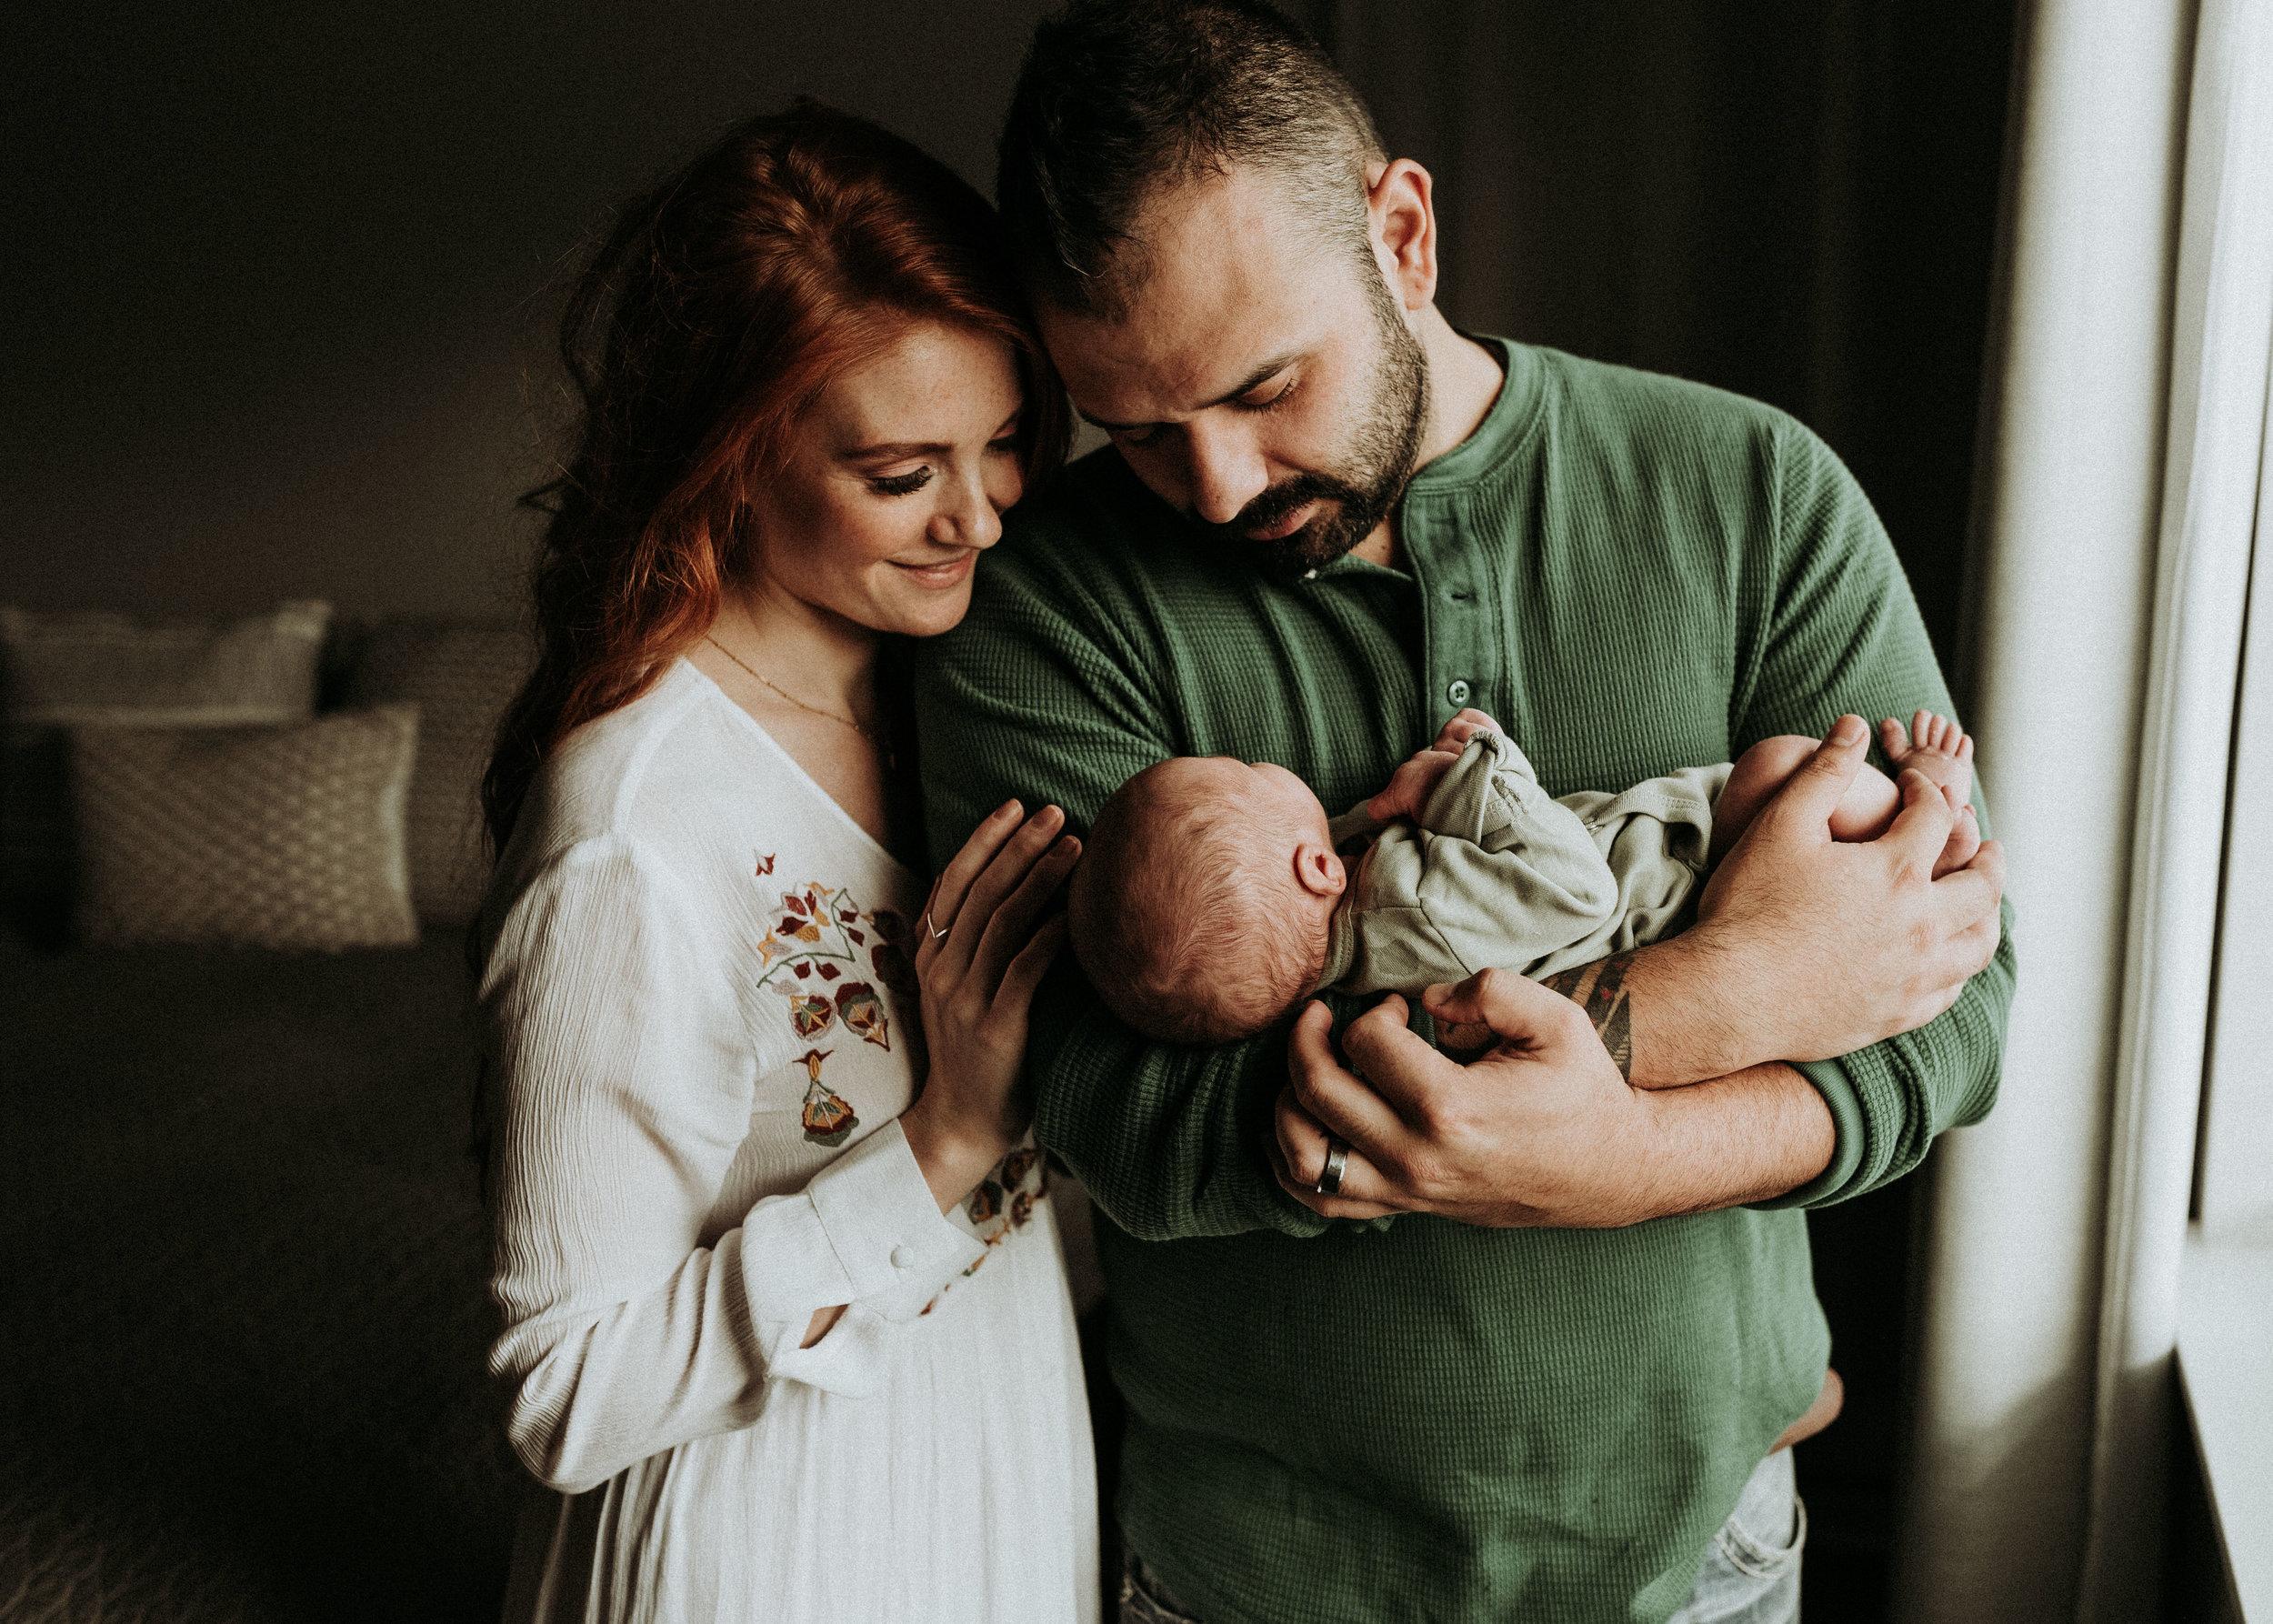 Newborn-Photographer-Bellingham-WA-Brianne-Bell-Photograpy-(Grayson)-10.jpg